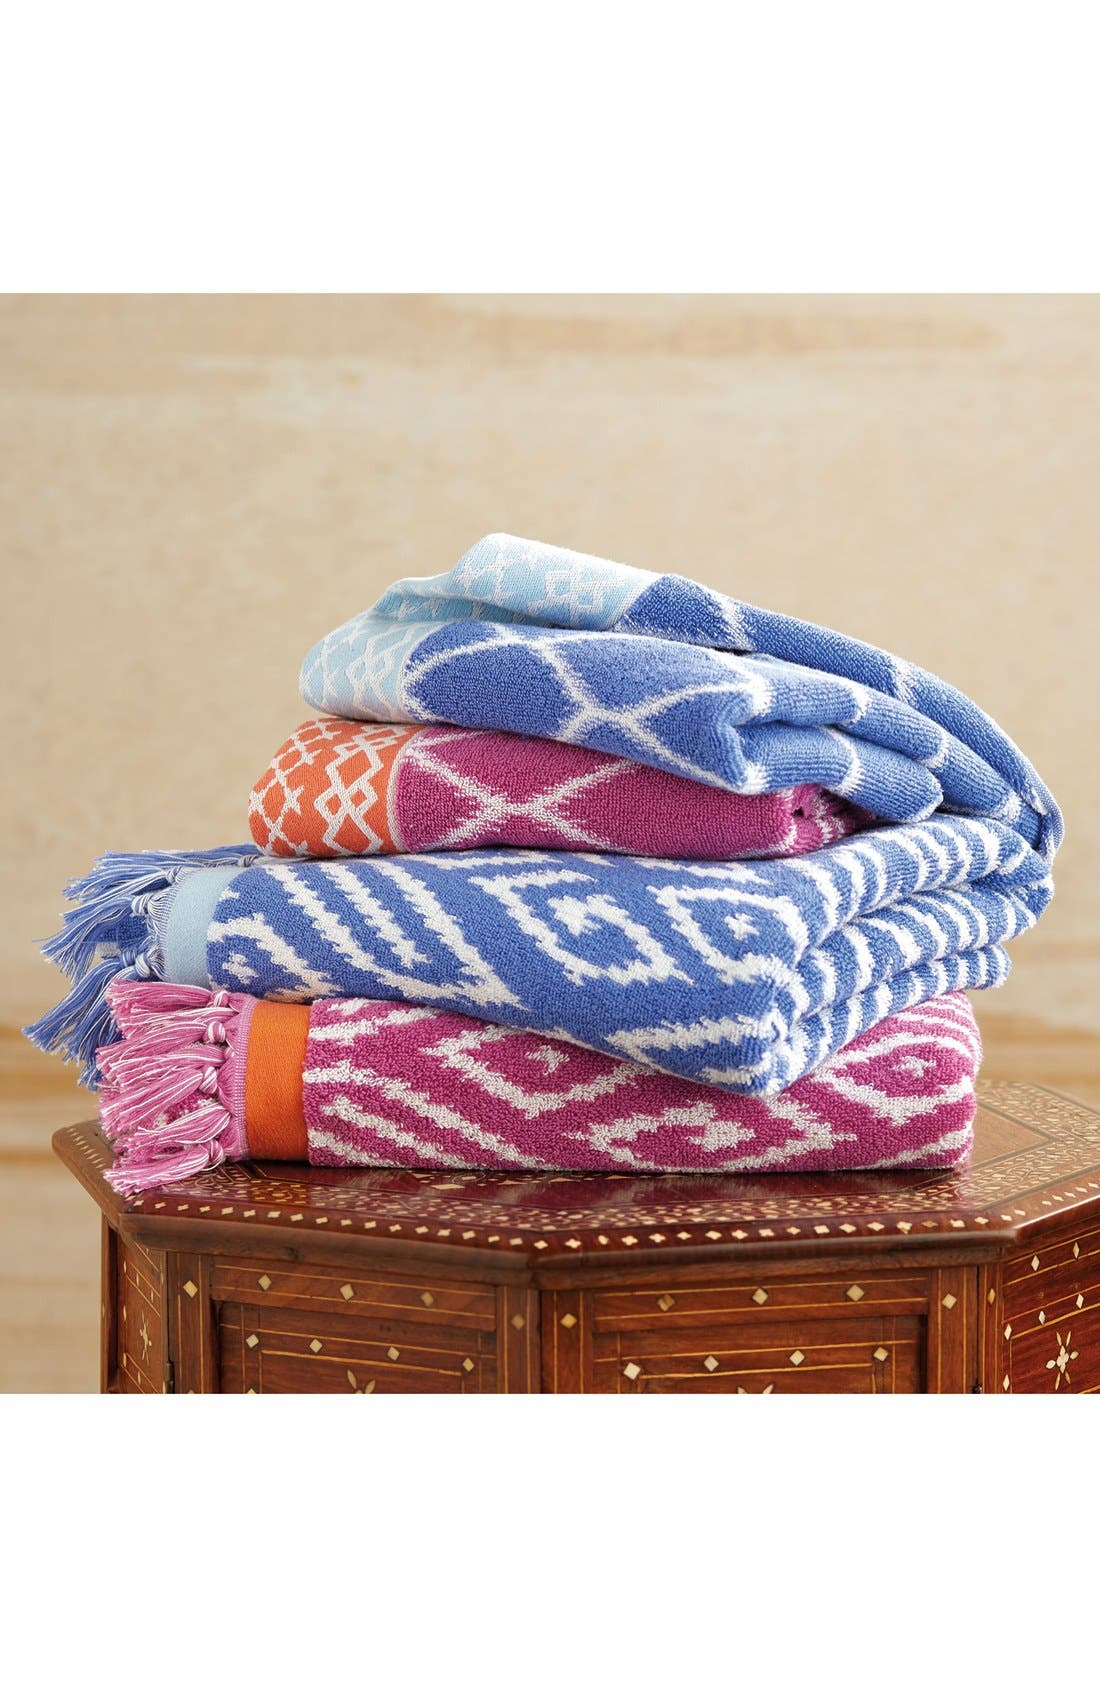 'Kalasin' Turkish Cotton Bath Towel,                             Alternate thumbnail 2, color,                             430